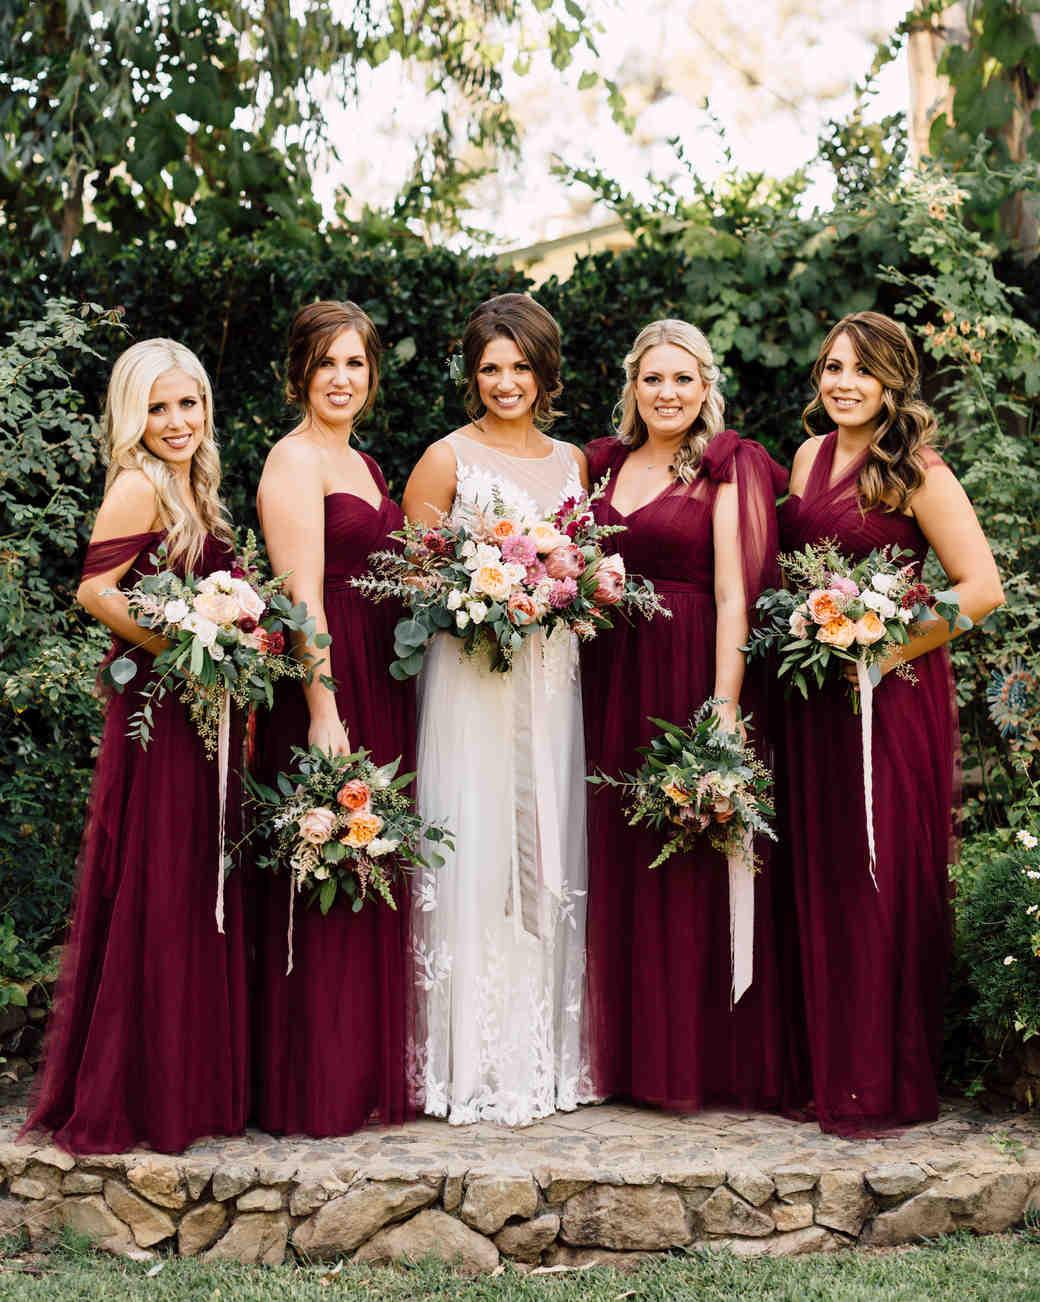 Our Favorite Seasonal Ideas for a Fall Wedding | Martha ...